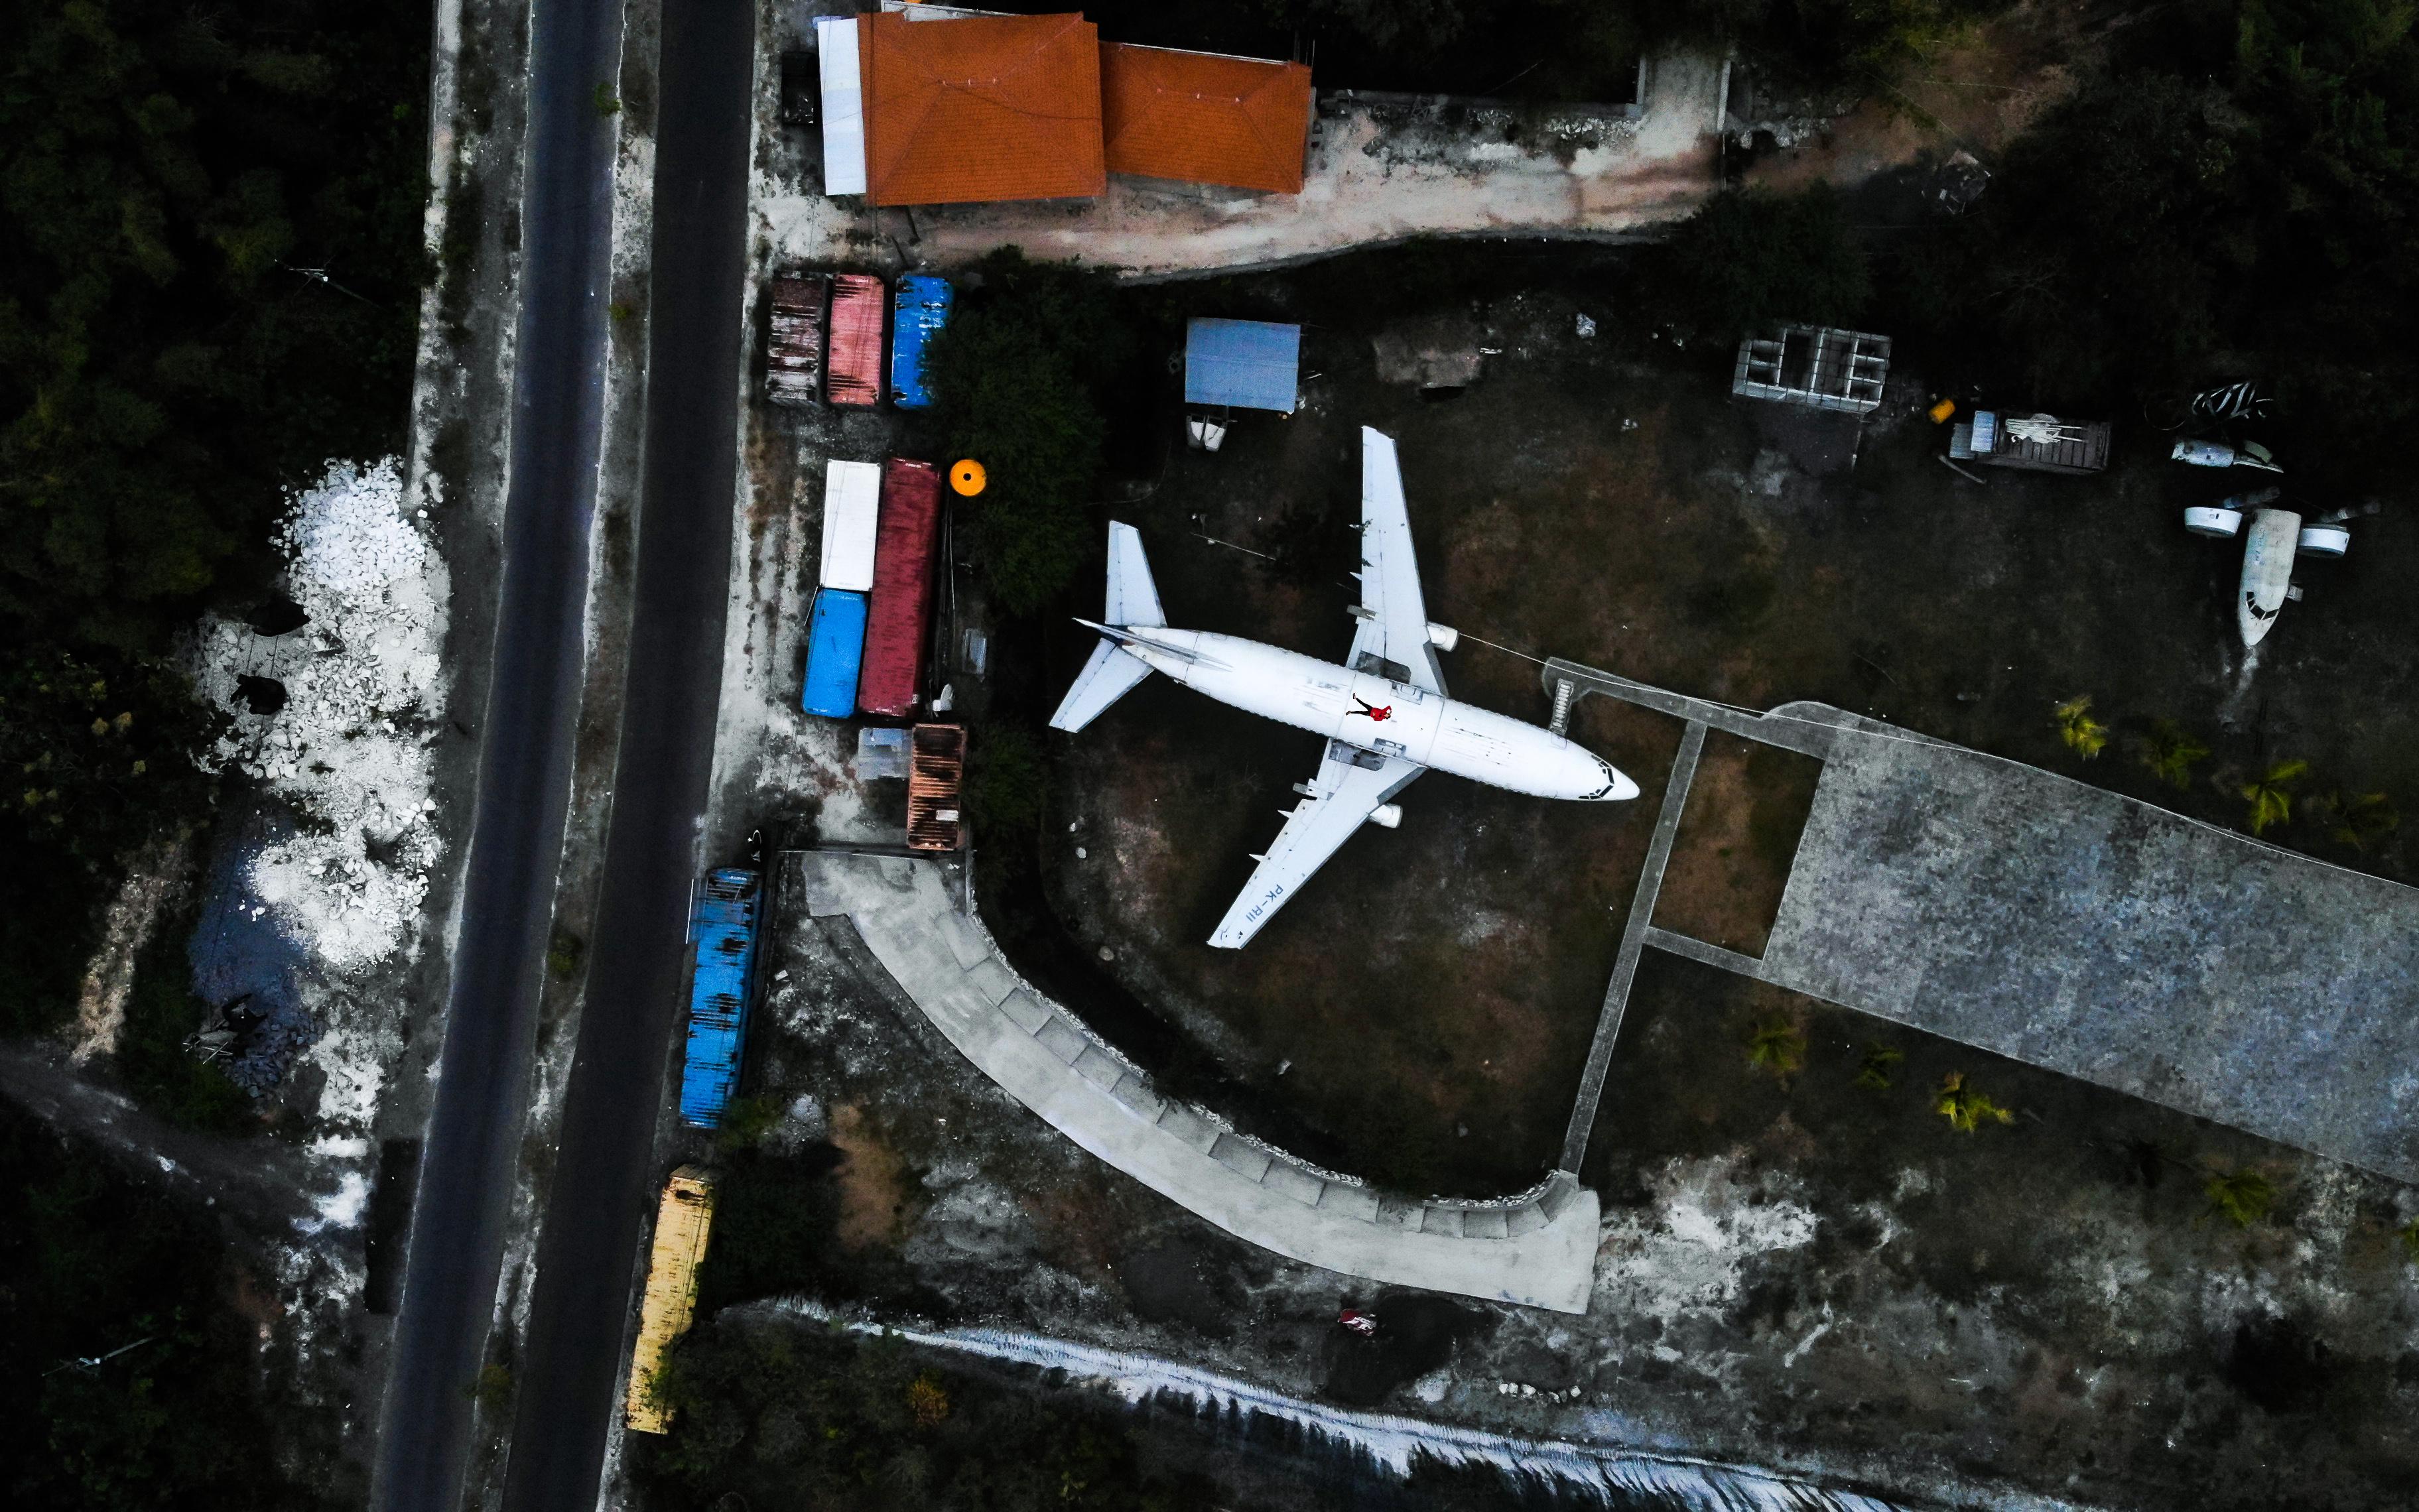 Aerial Shot Of White Airplane